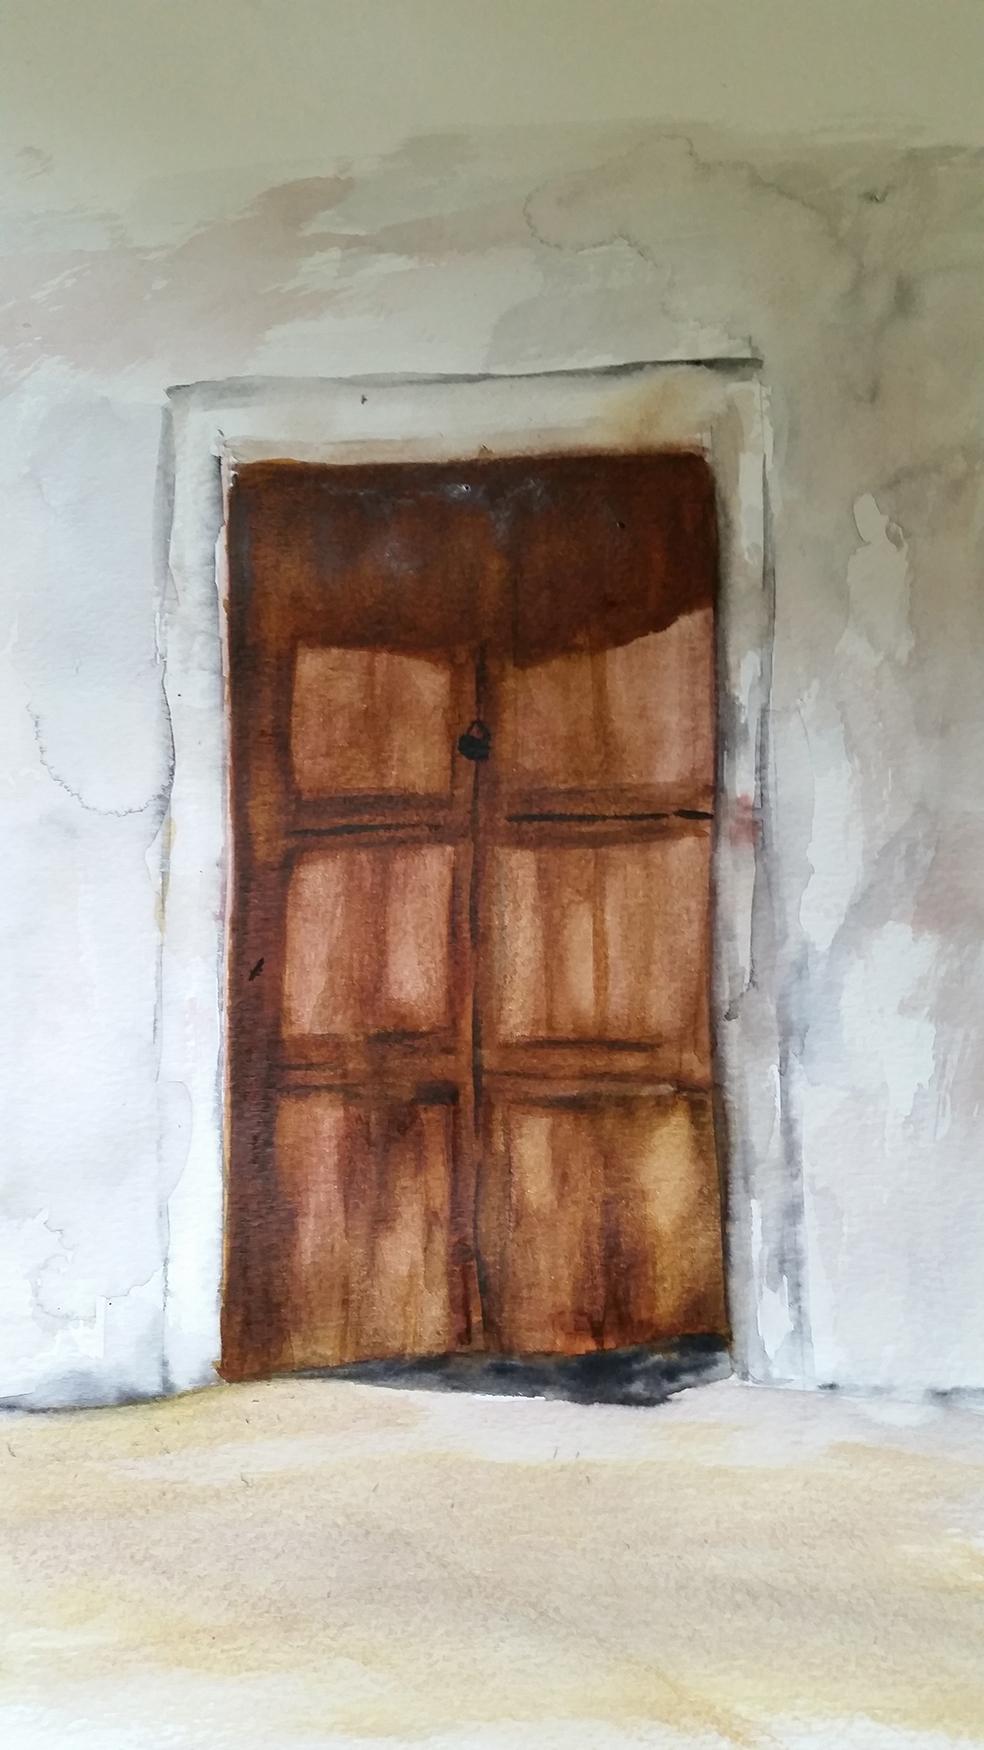 Porte marron chouchou.jpg